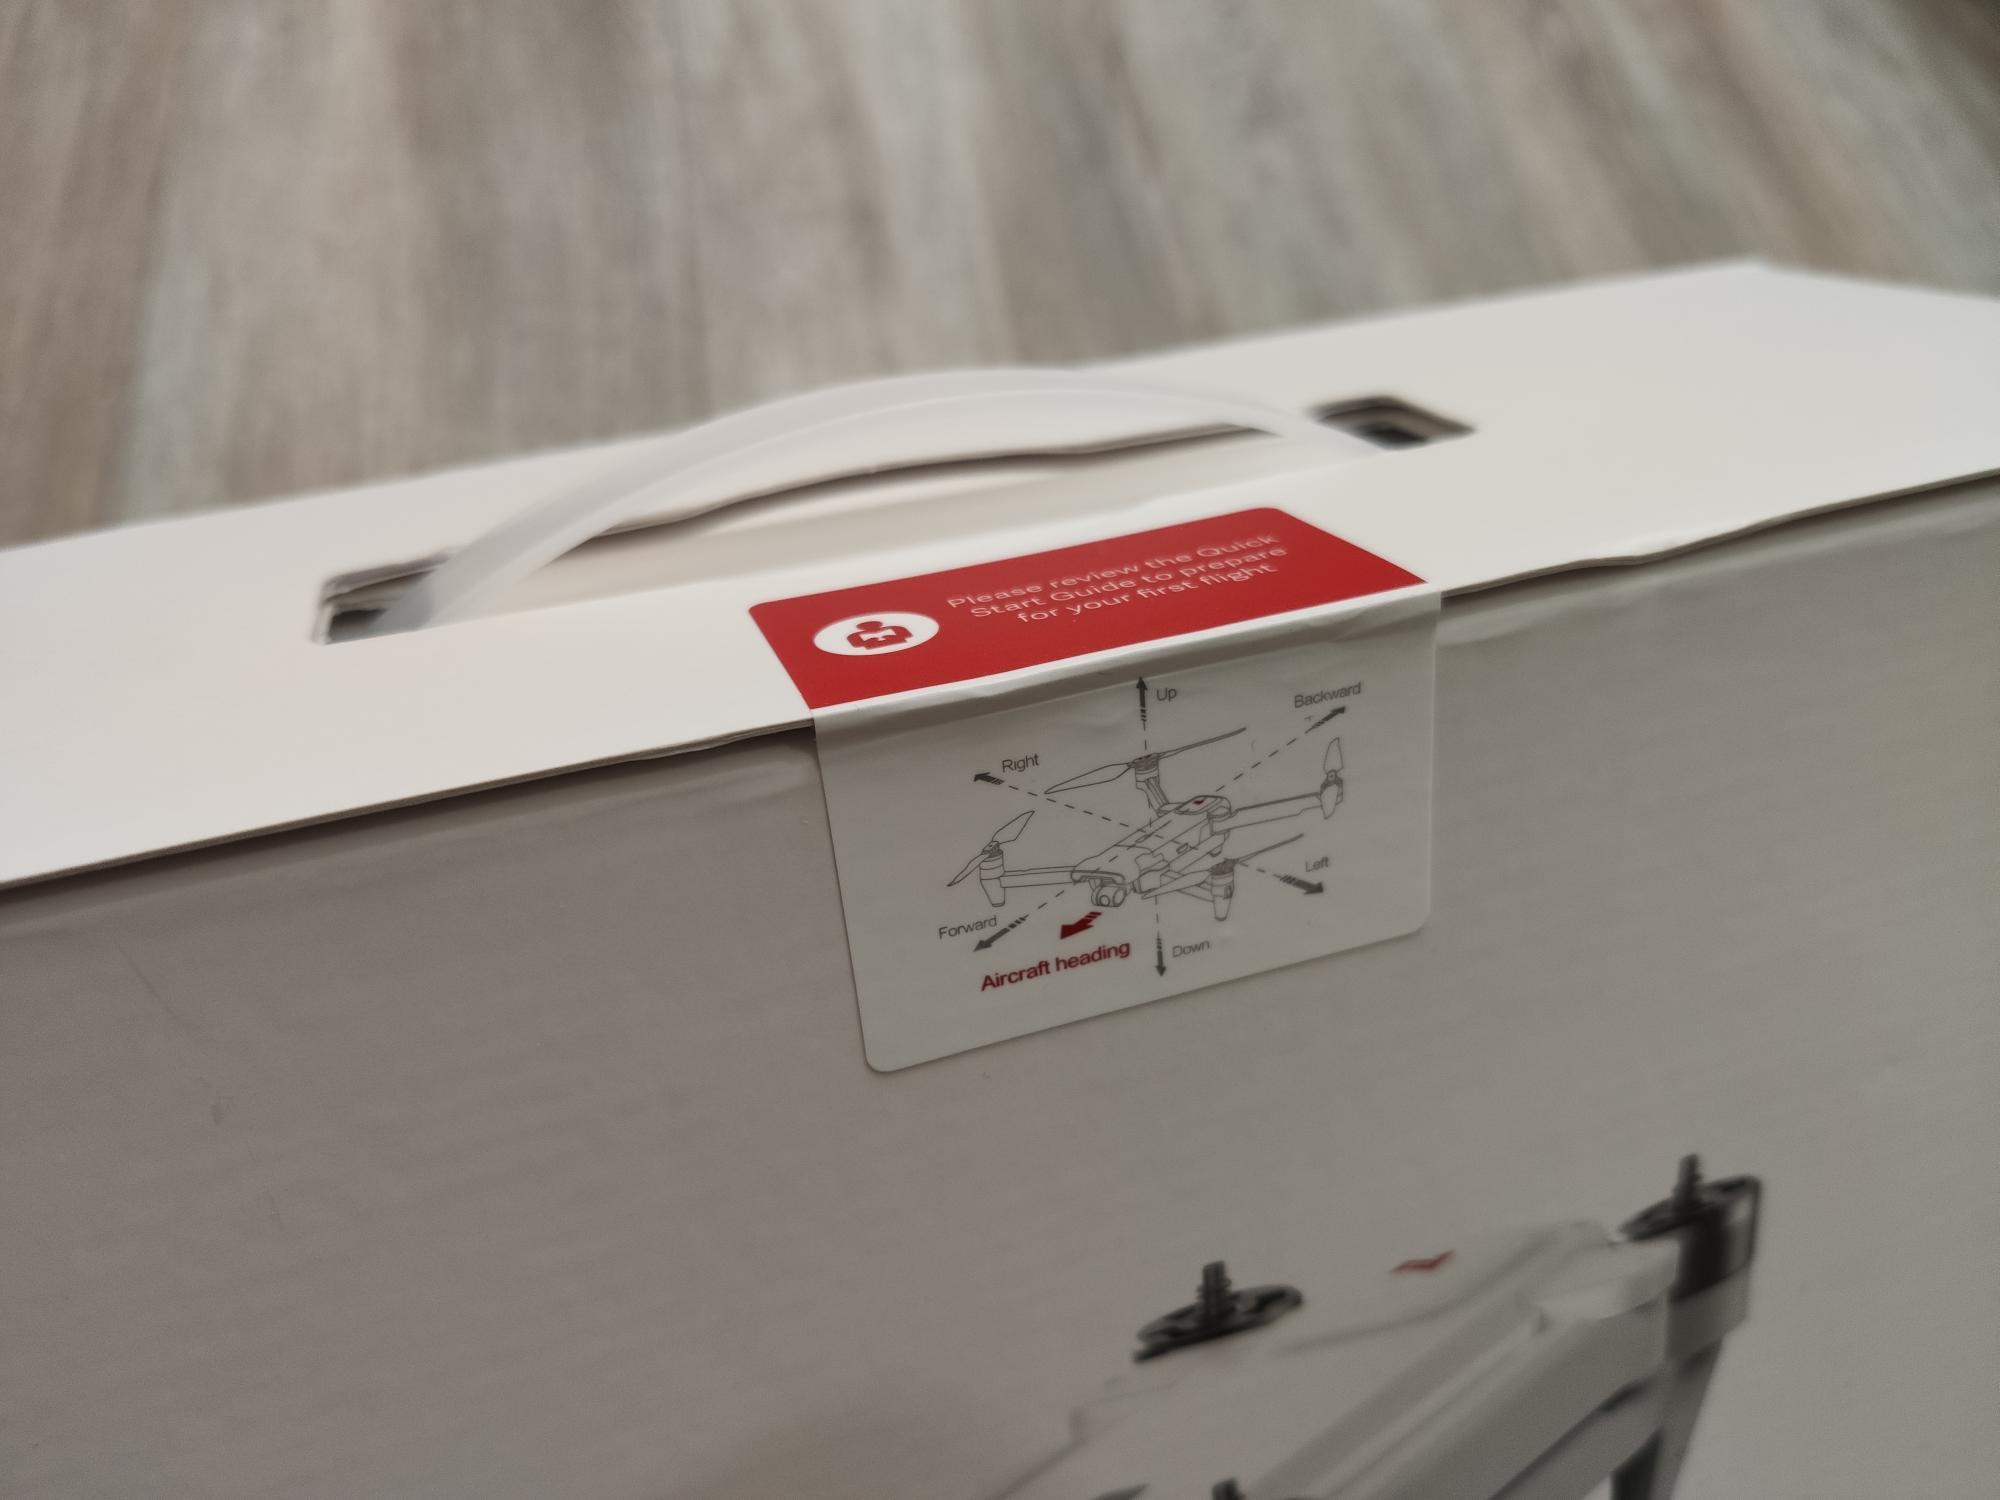 Квадрокоптер Xiaomi FiMi X8 SE 2020 (новый) 89255244257 купить 2